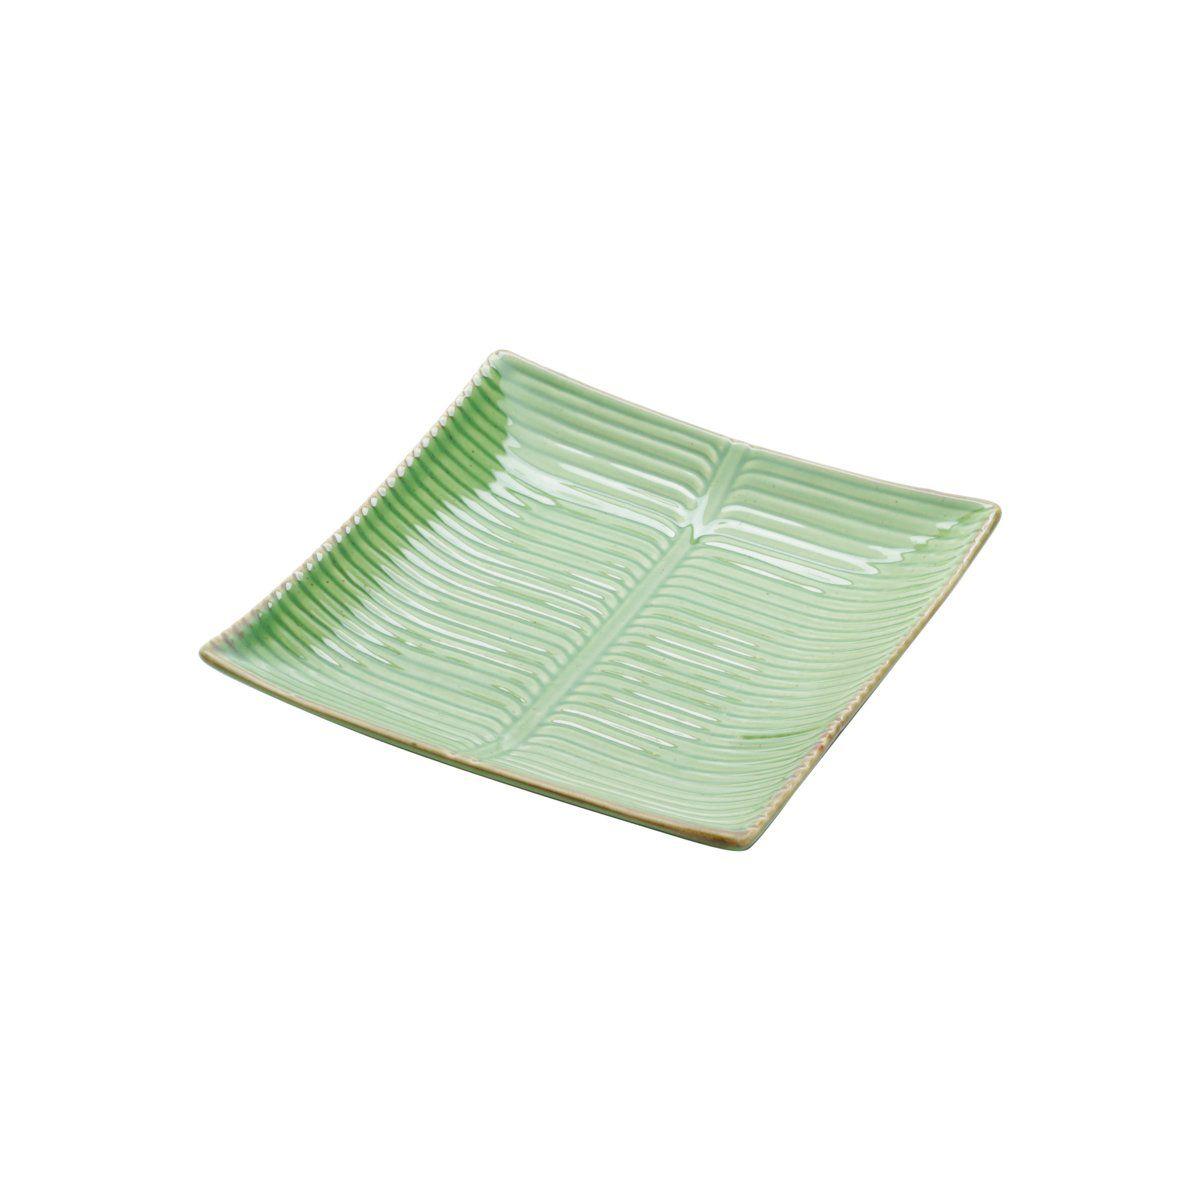 Prato decorativo 12 x 12 cm de cerâmica verde Banana Leaf Lyor - L4131